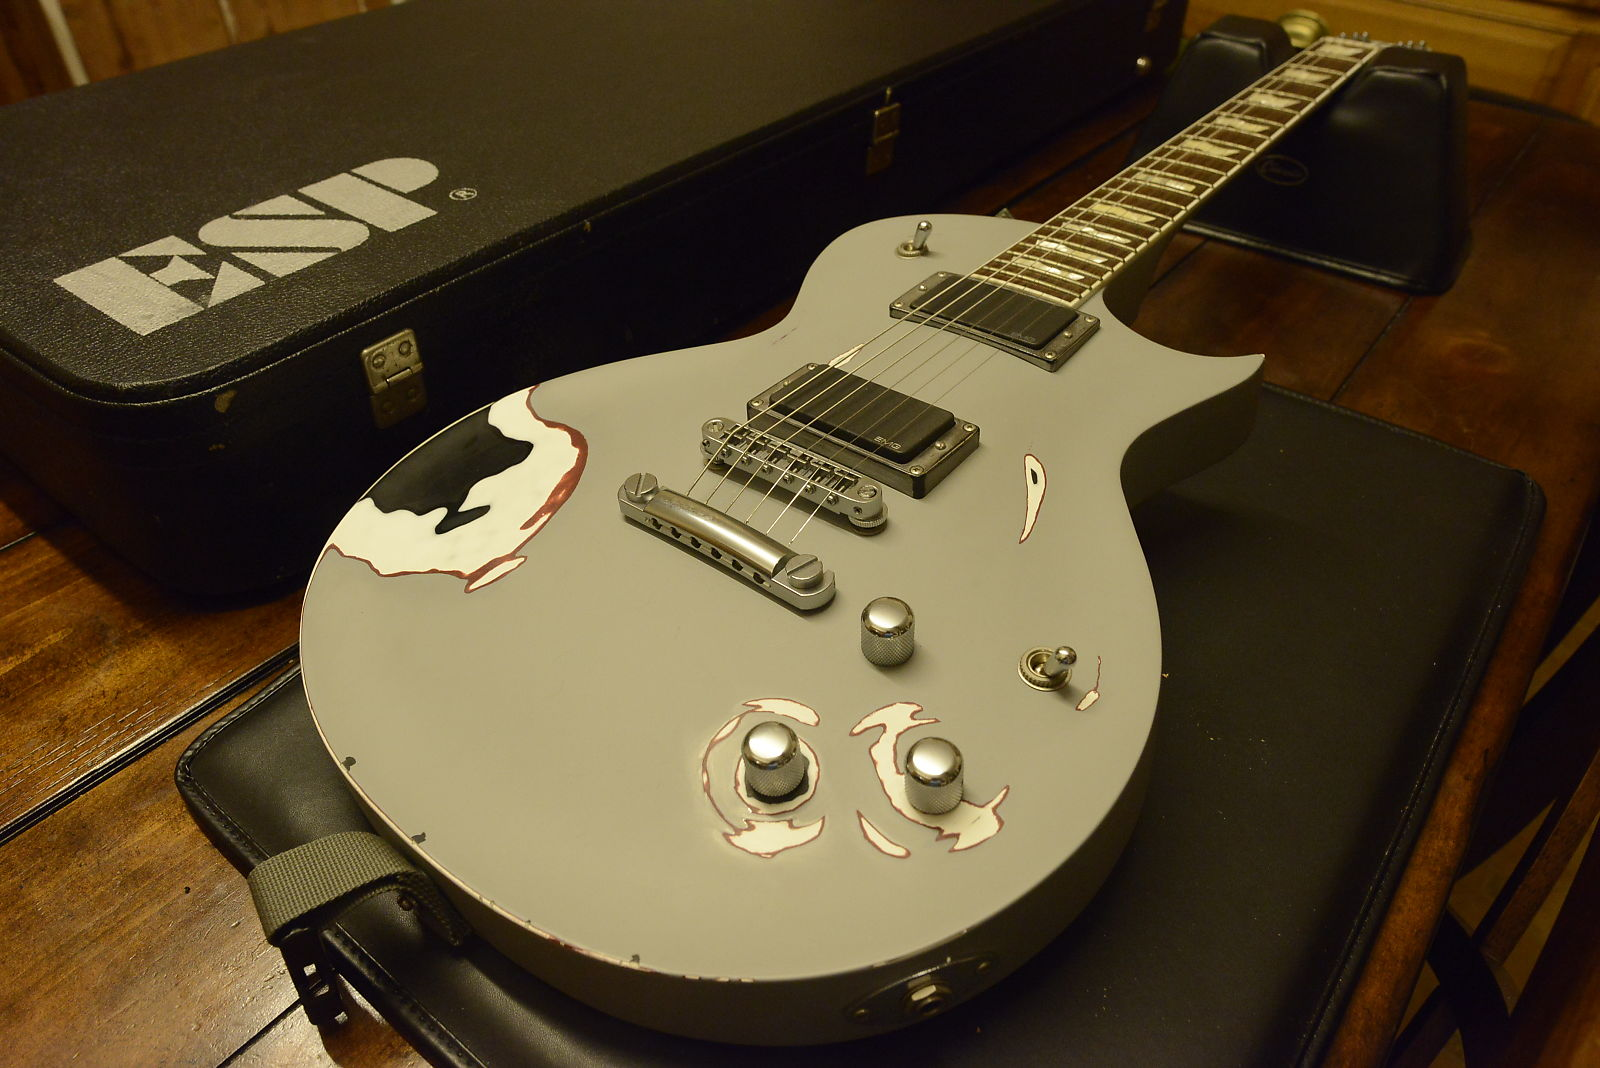 esp james hetfield metallica truckster signature guitar emg 81 60 tonepros custom eclipse. Black Bedroom Furniture Sets. Home Design Ideas